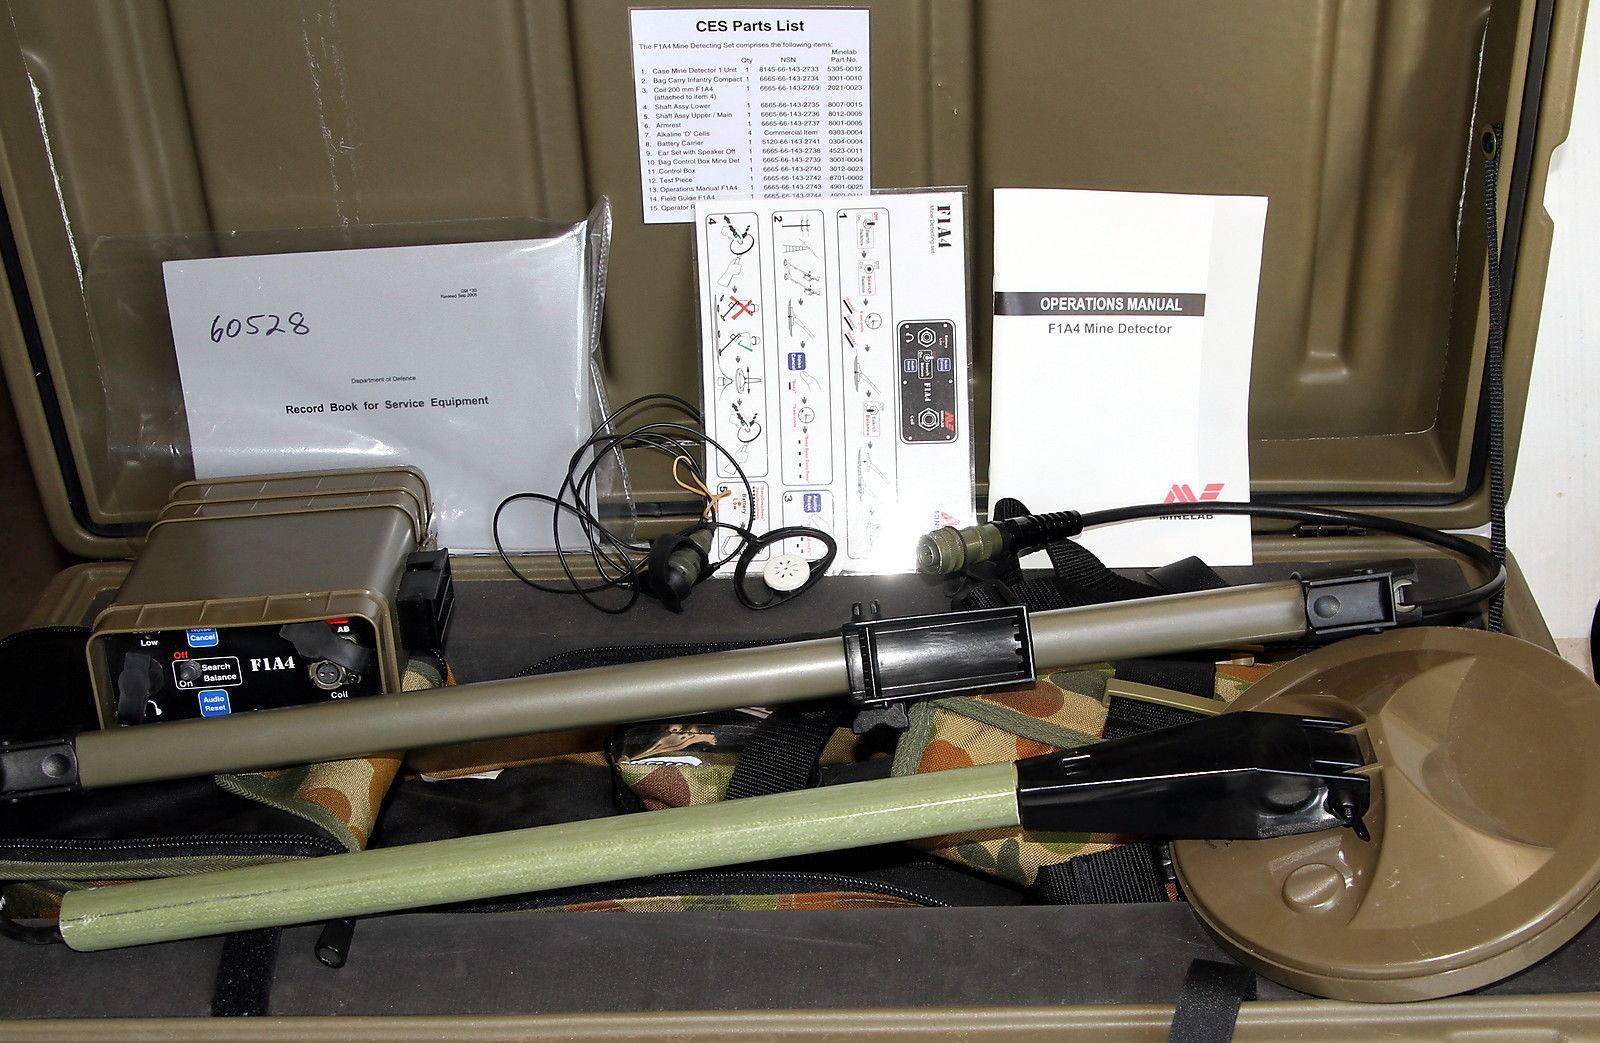 Minelab F1A4 GOLD & METAL Detector + Military Ordnance Clearance-